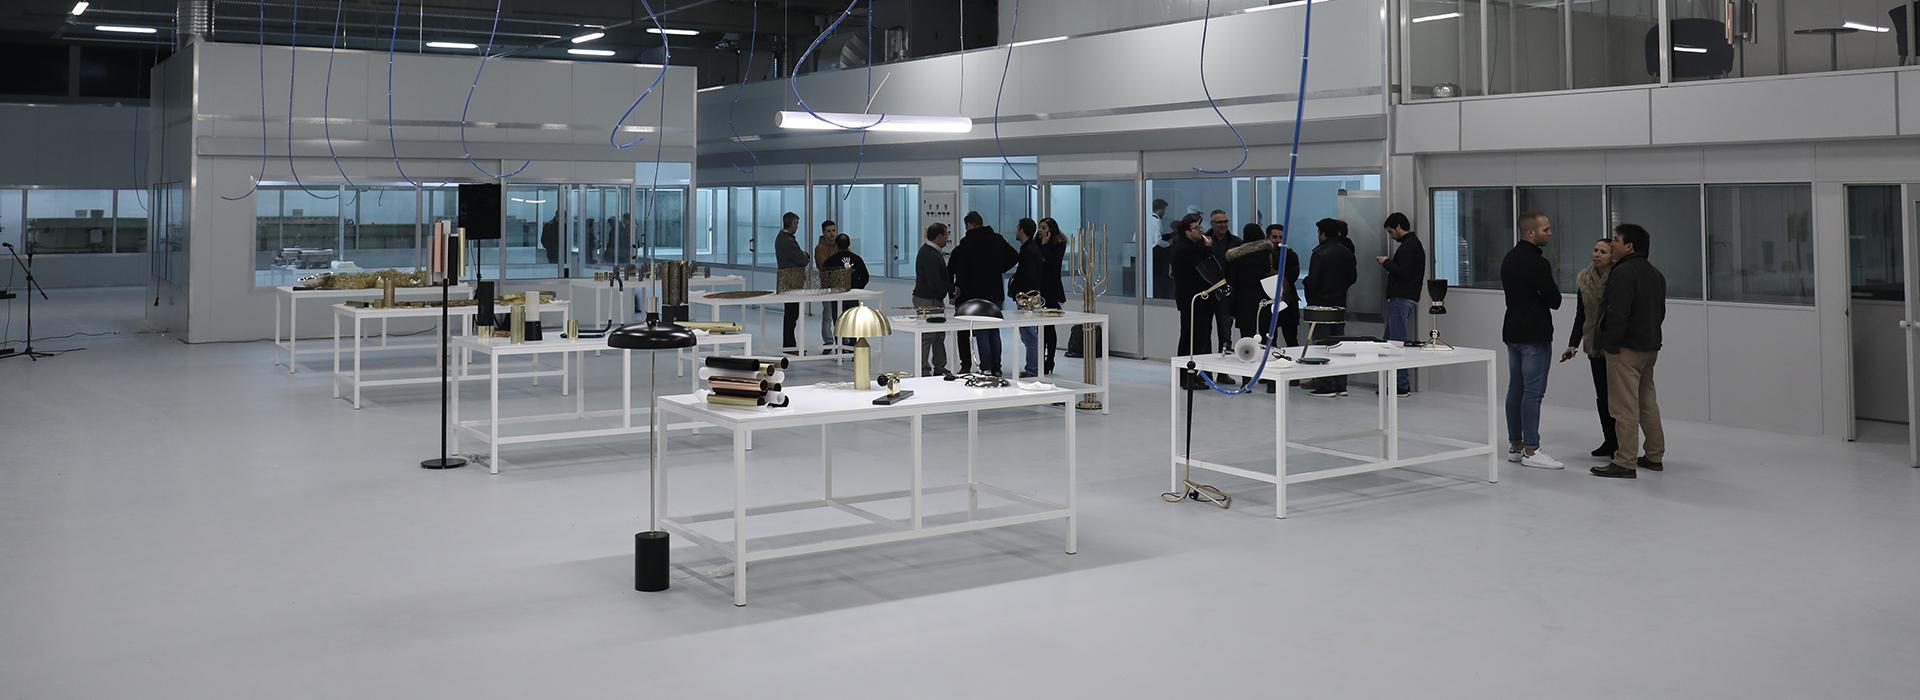 New Preggo Lighting Factory